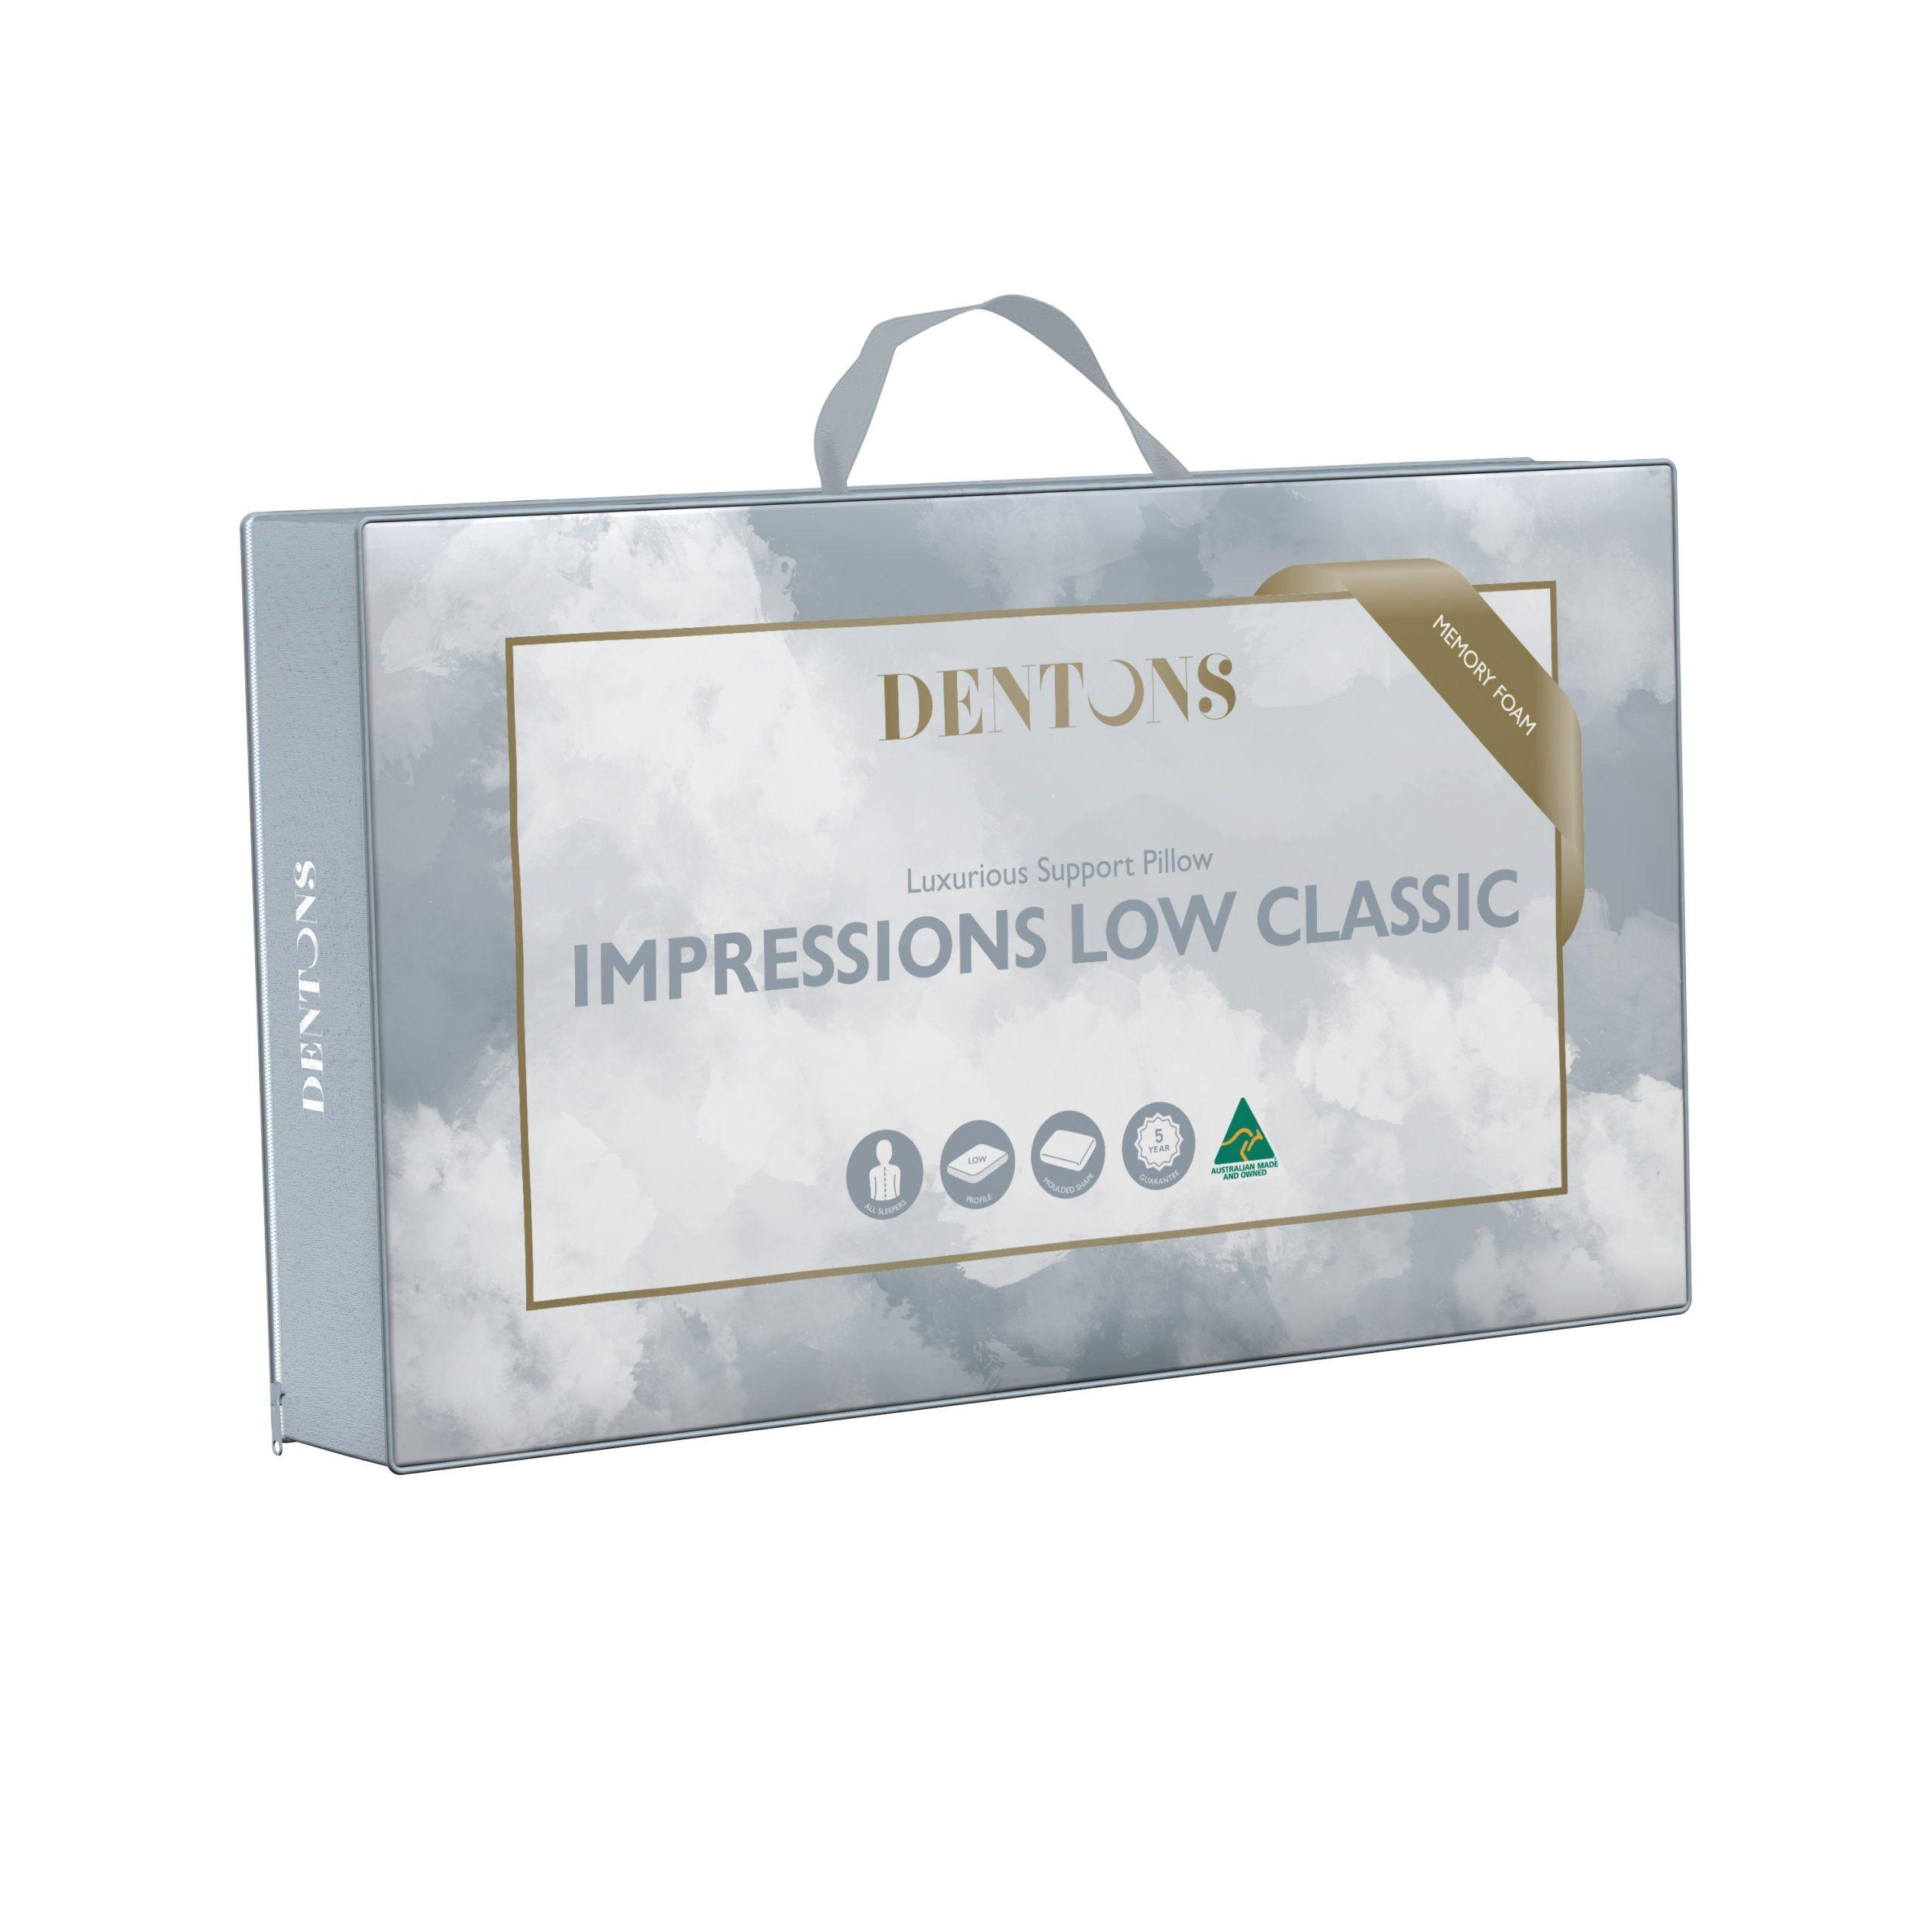 Dentons Impressions Low Classic